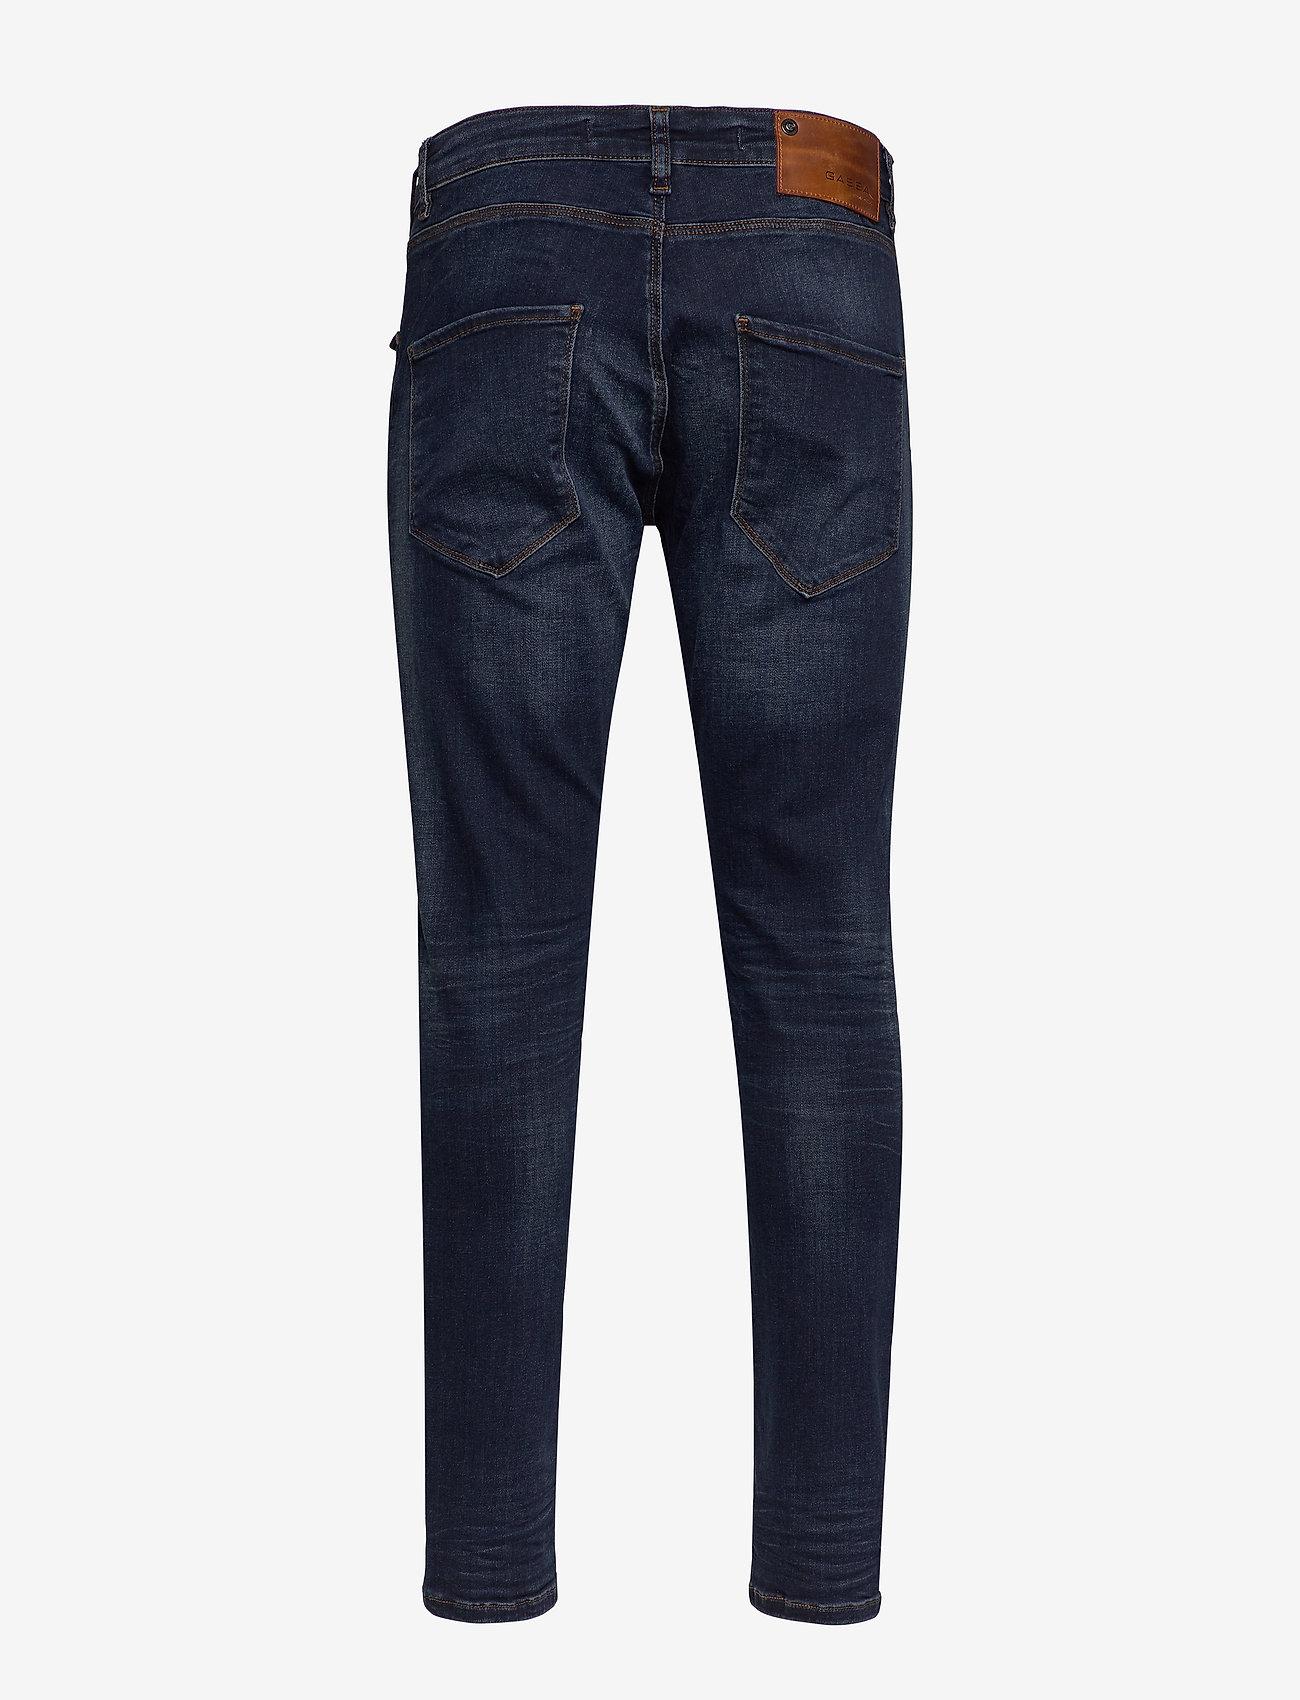 Gabba - Rey K3606 Mid Blue Jeans - slim jeans - rs1293 - 1